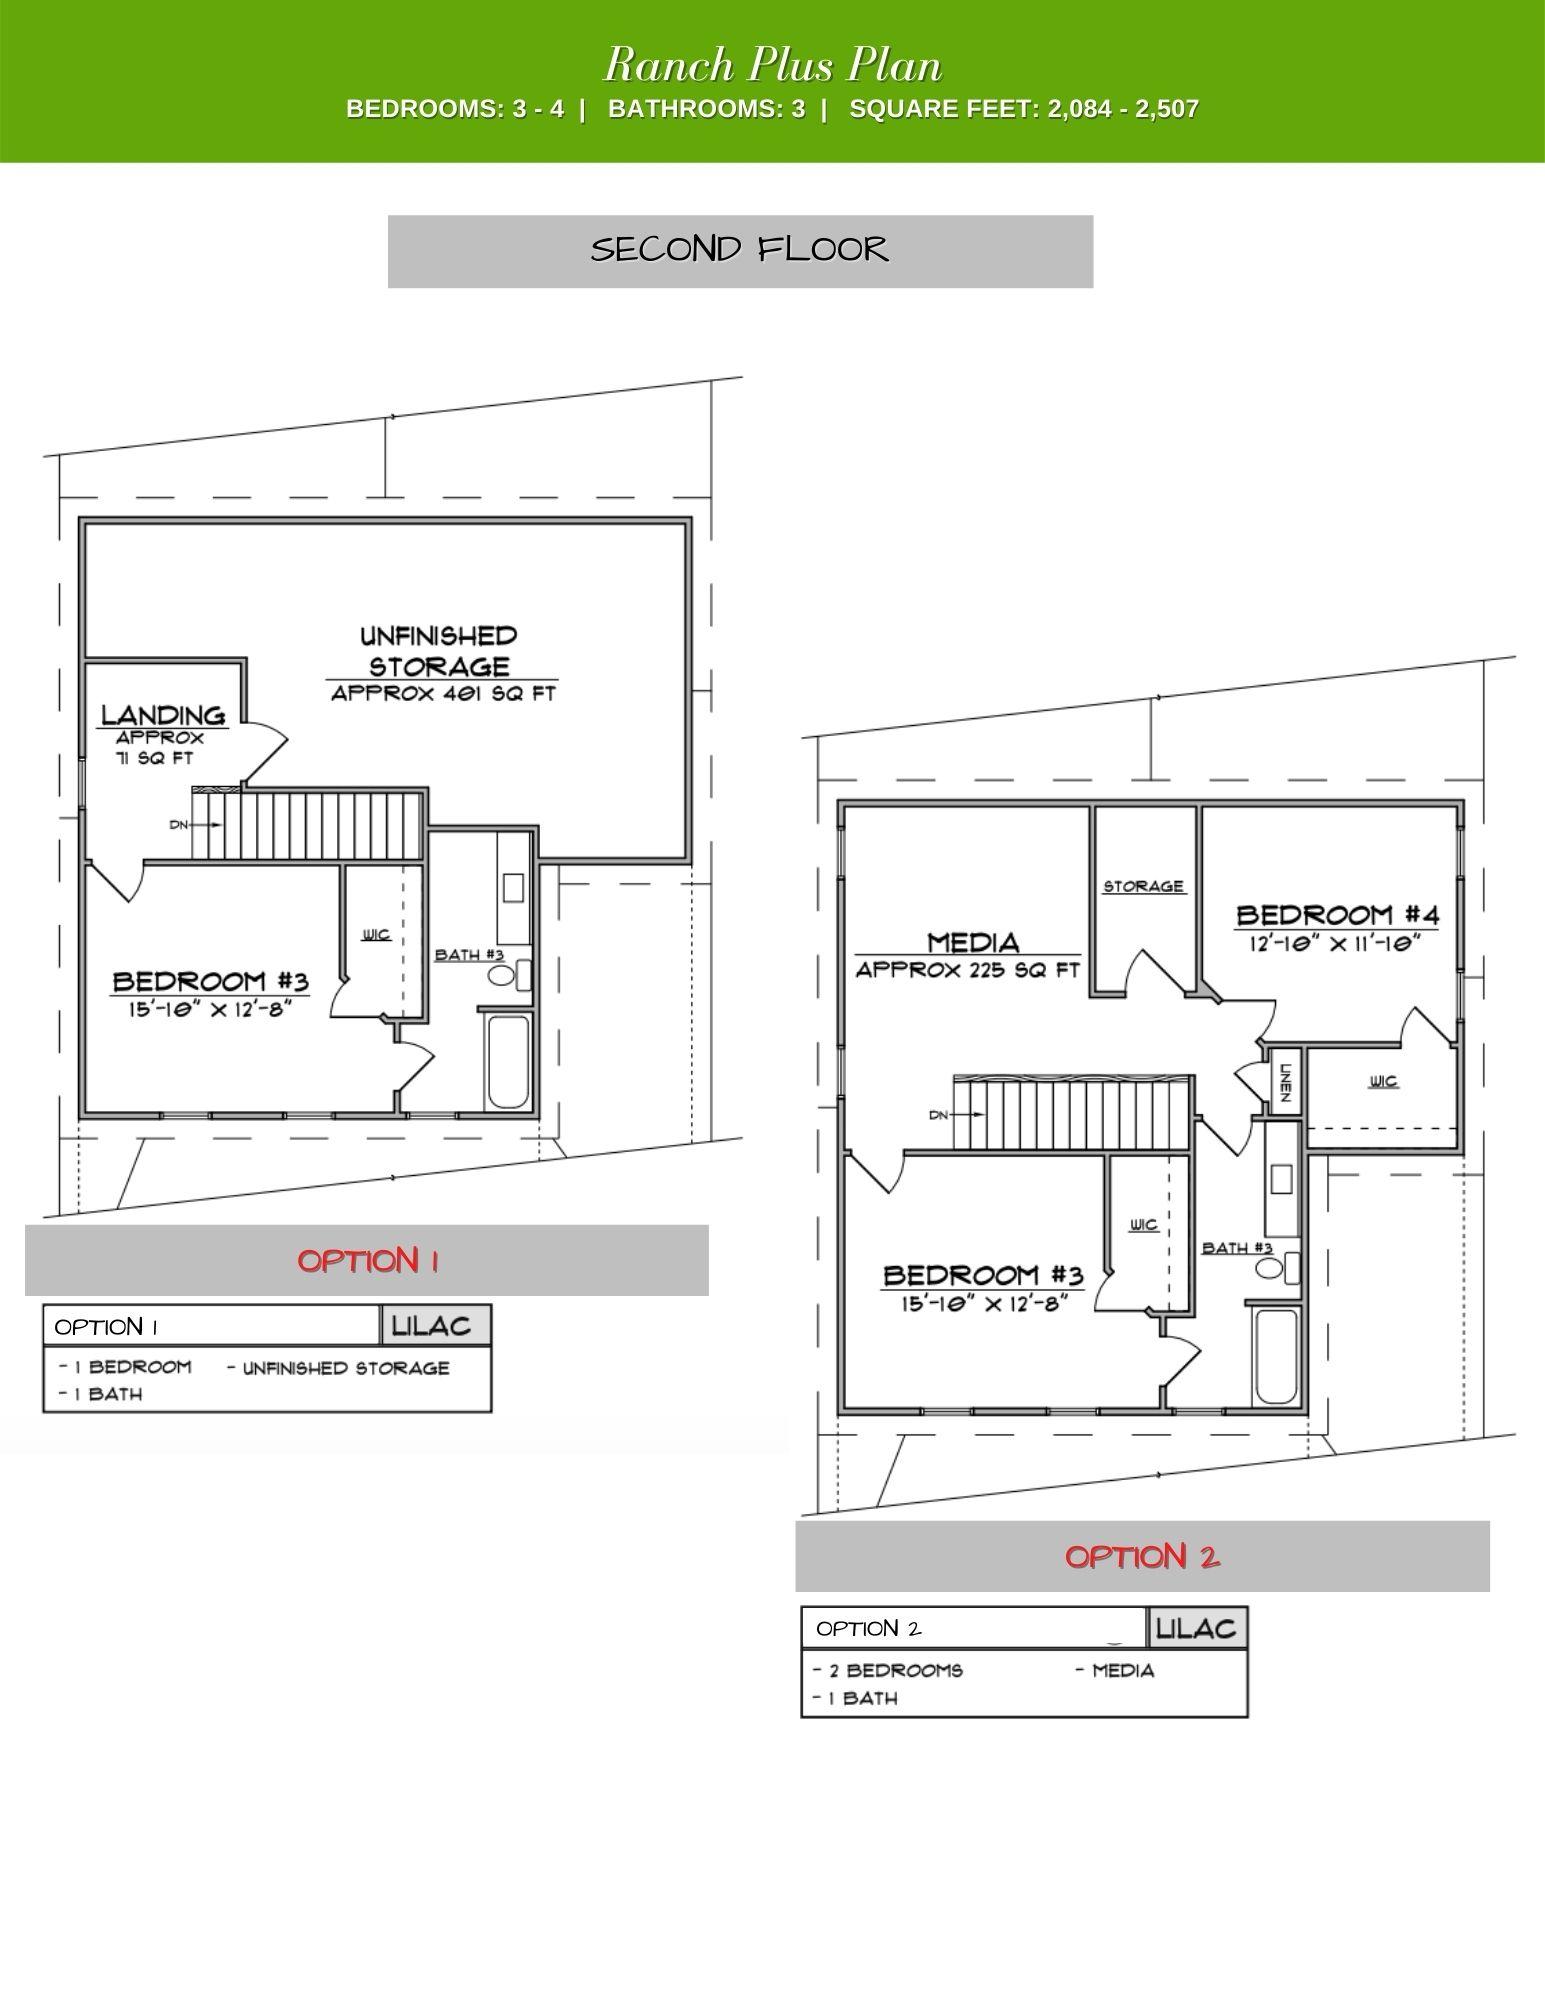 Lilac 2nd Floor Plan